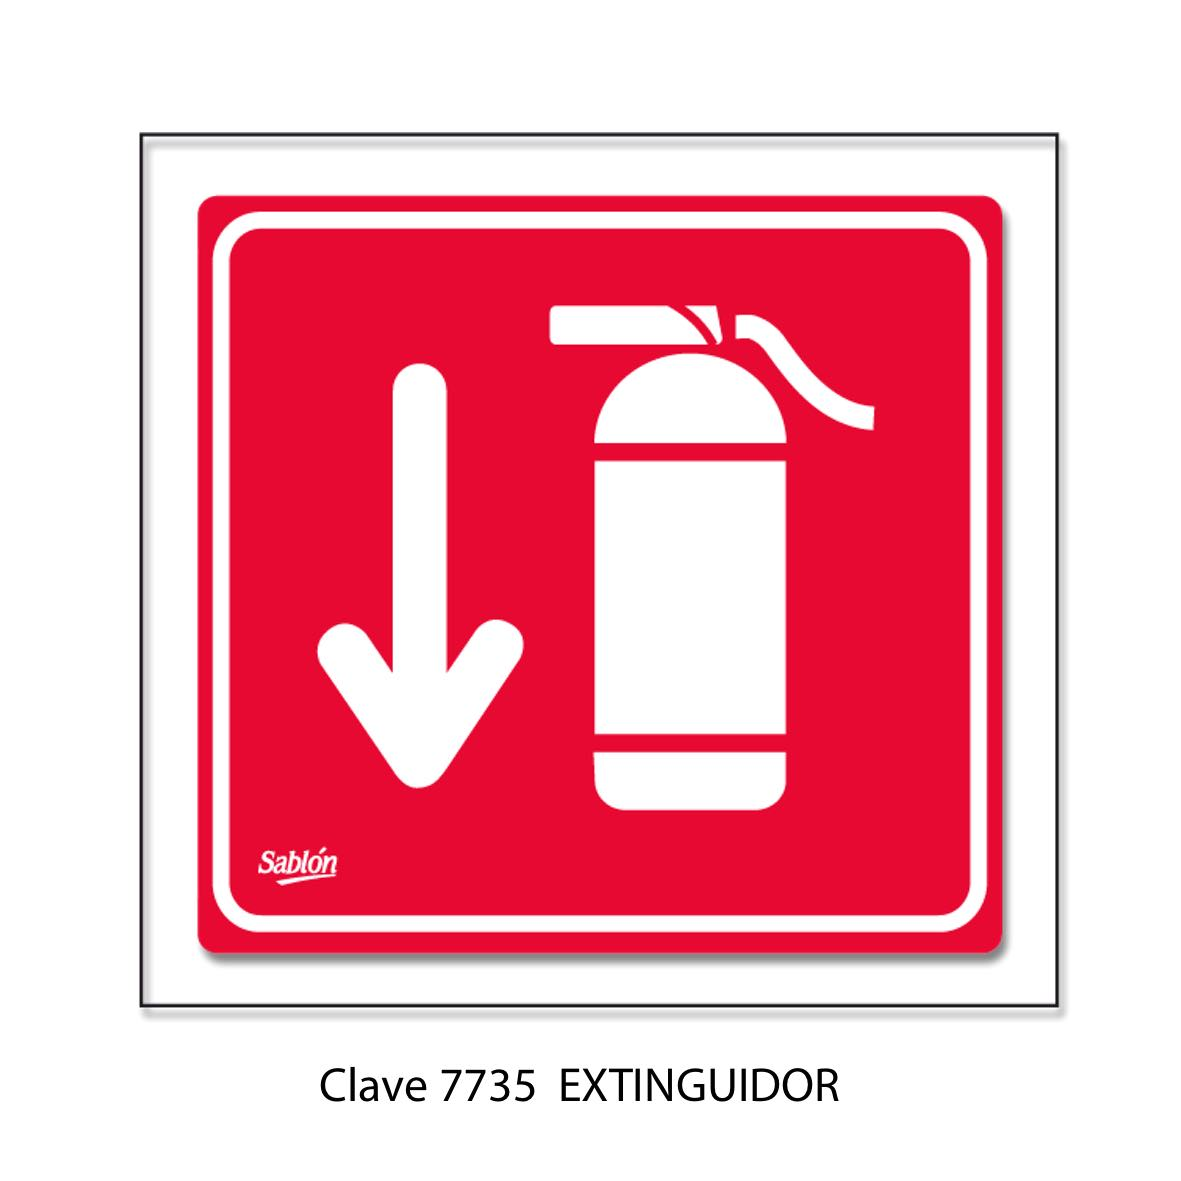 Señal de Extinguidor Modelo 7735 - Sablón